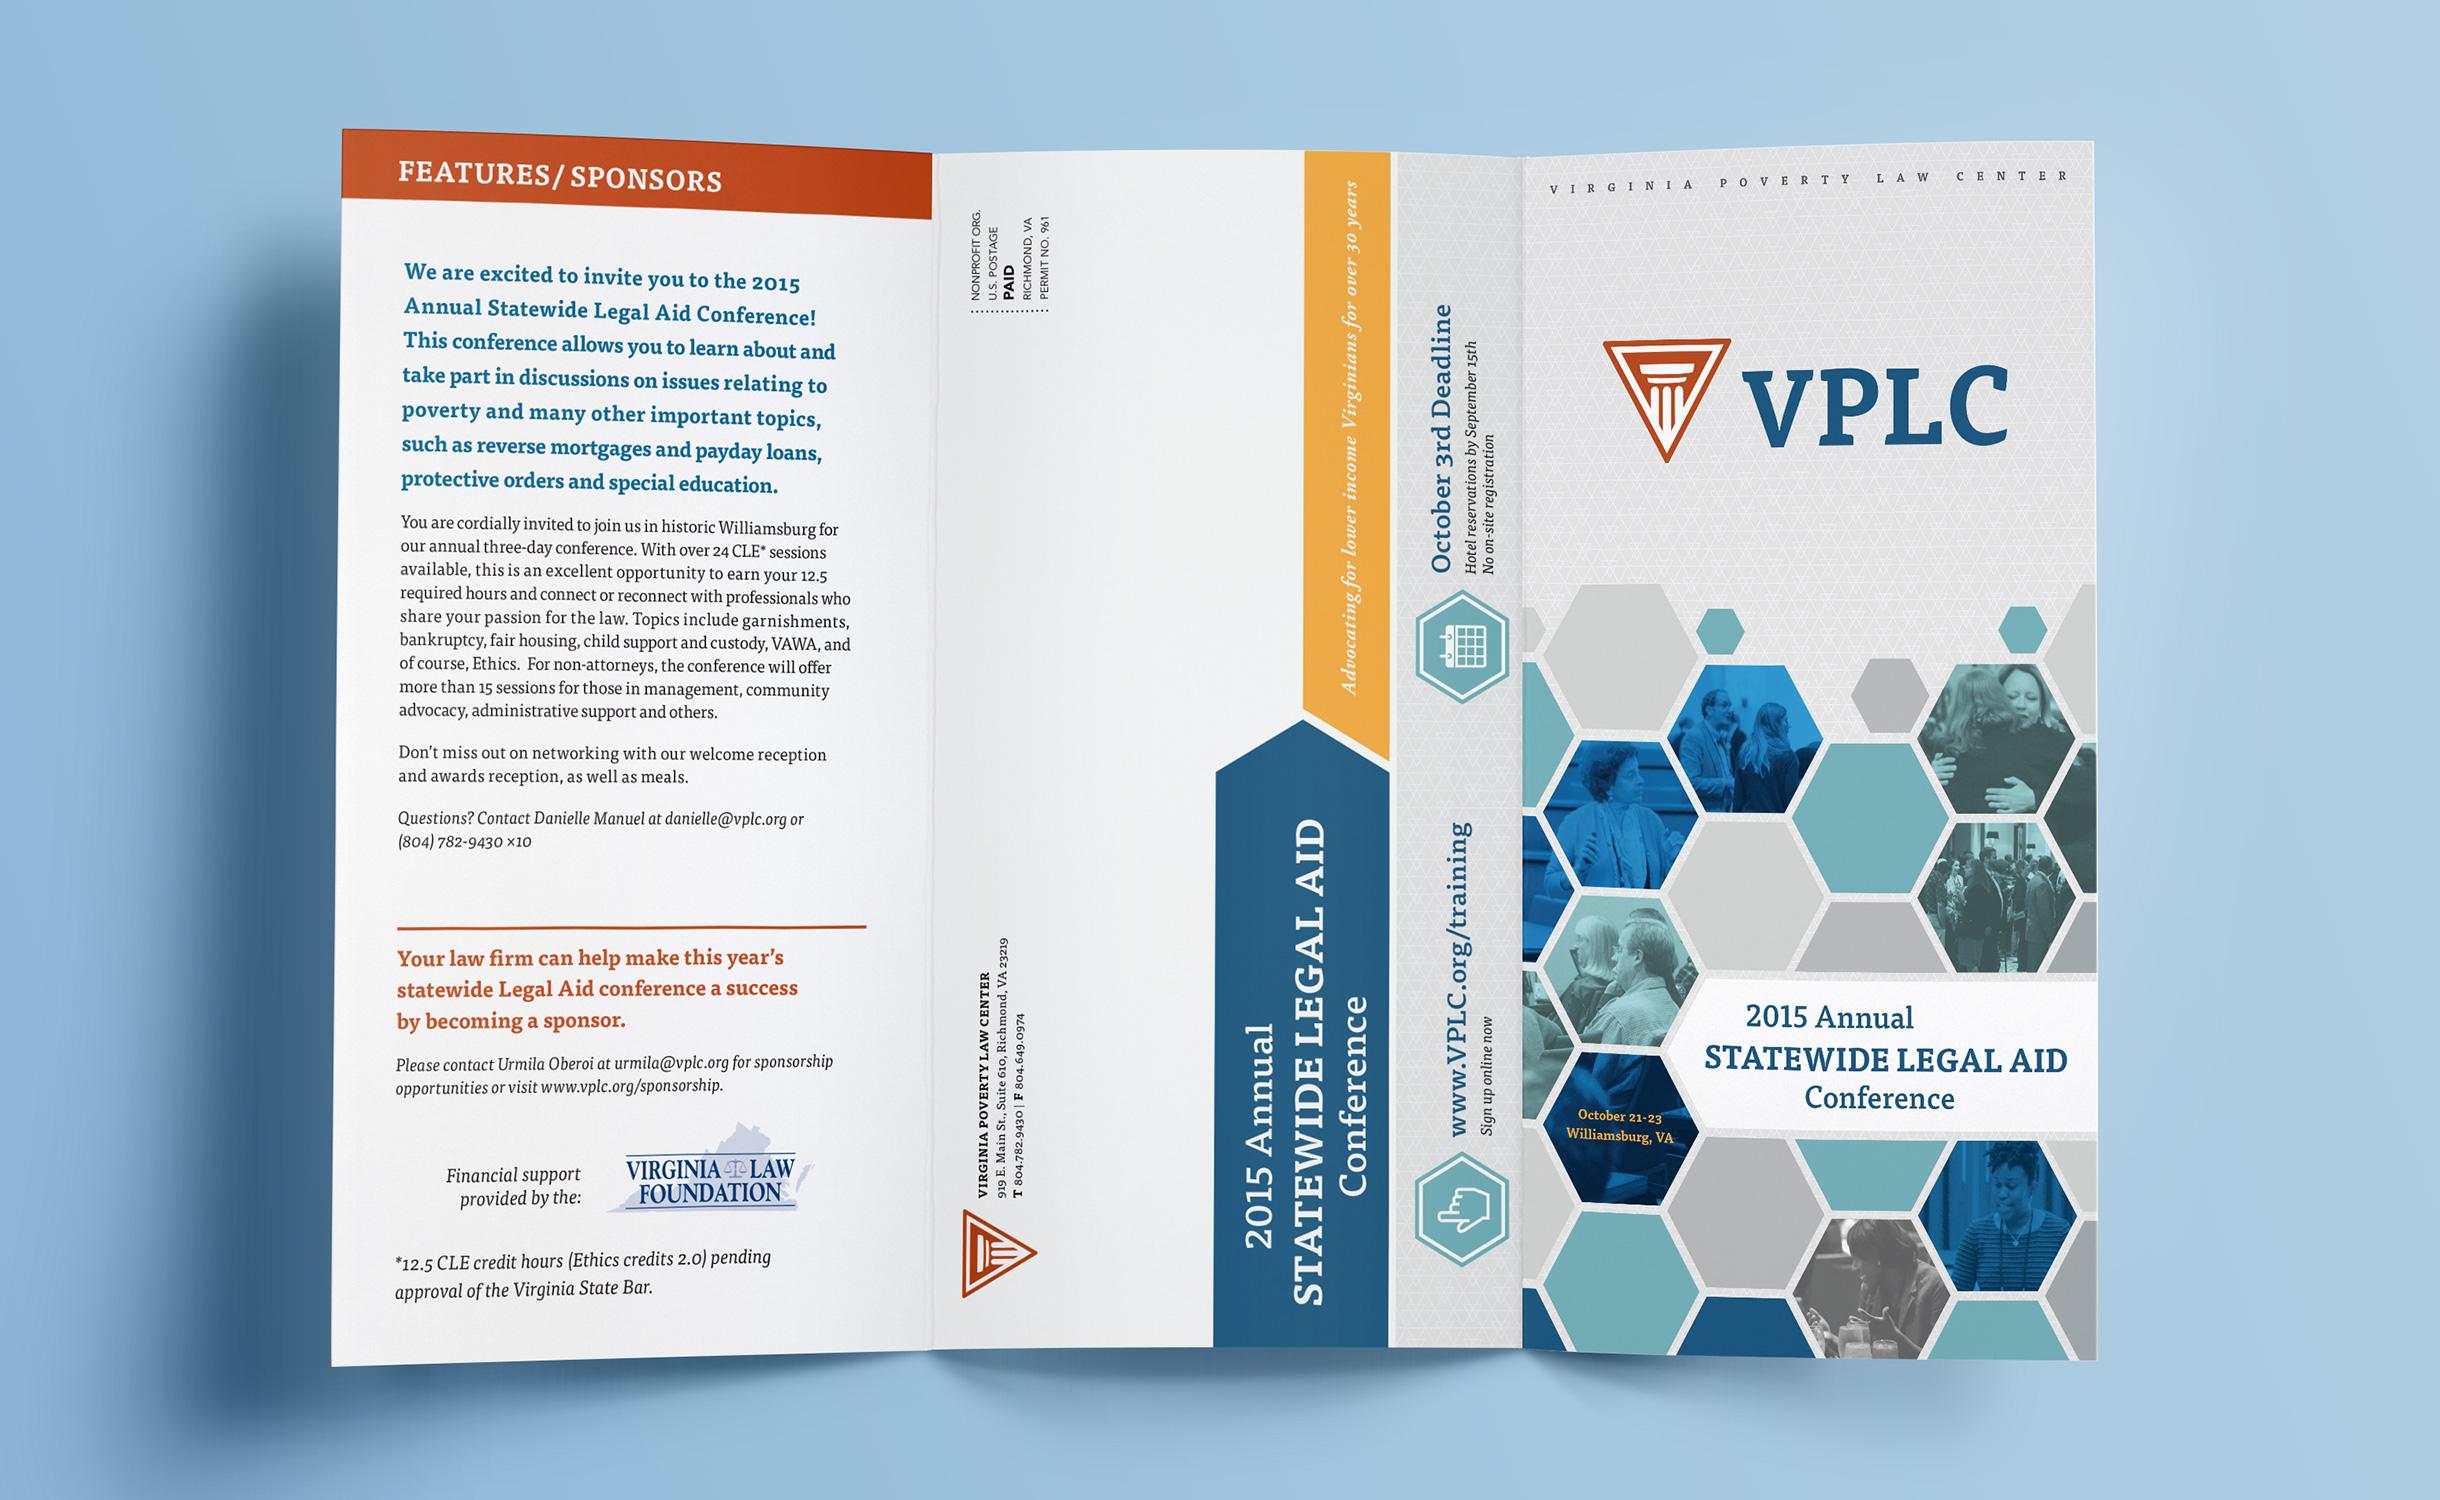 WEBSITE_VPLC_SaveTheDateOutside